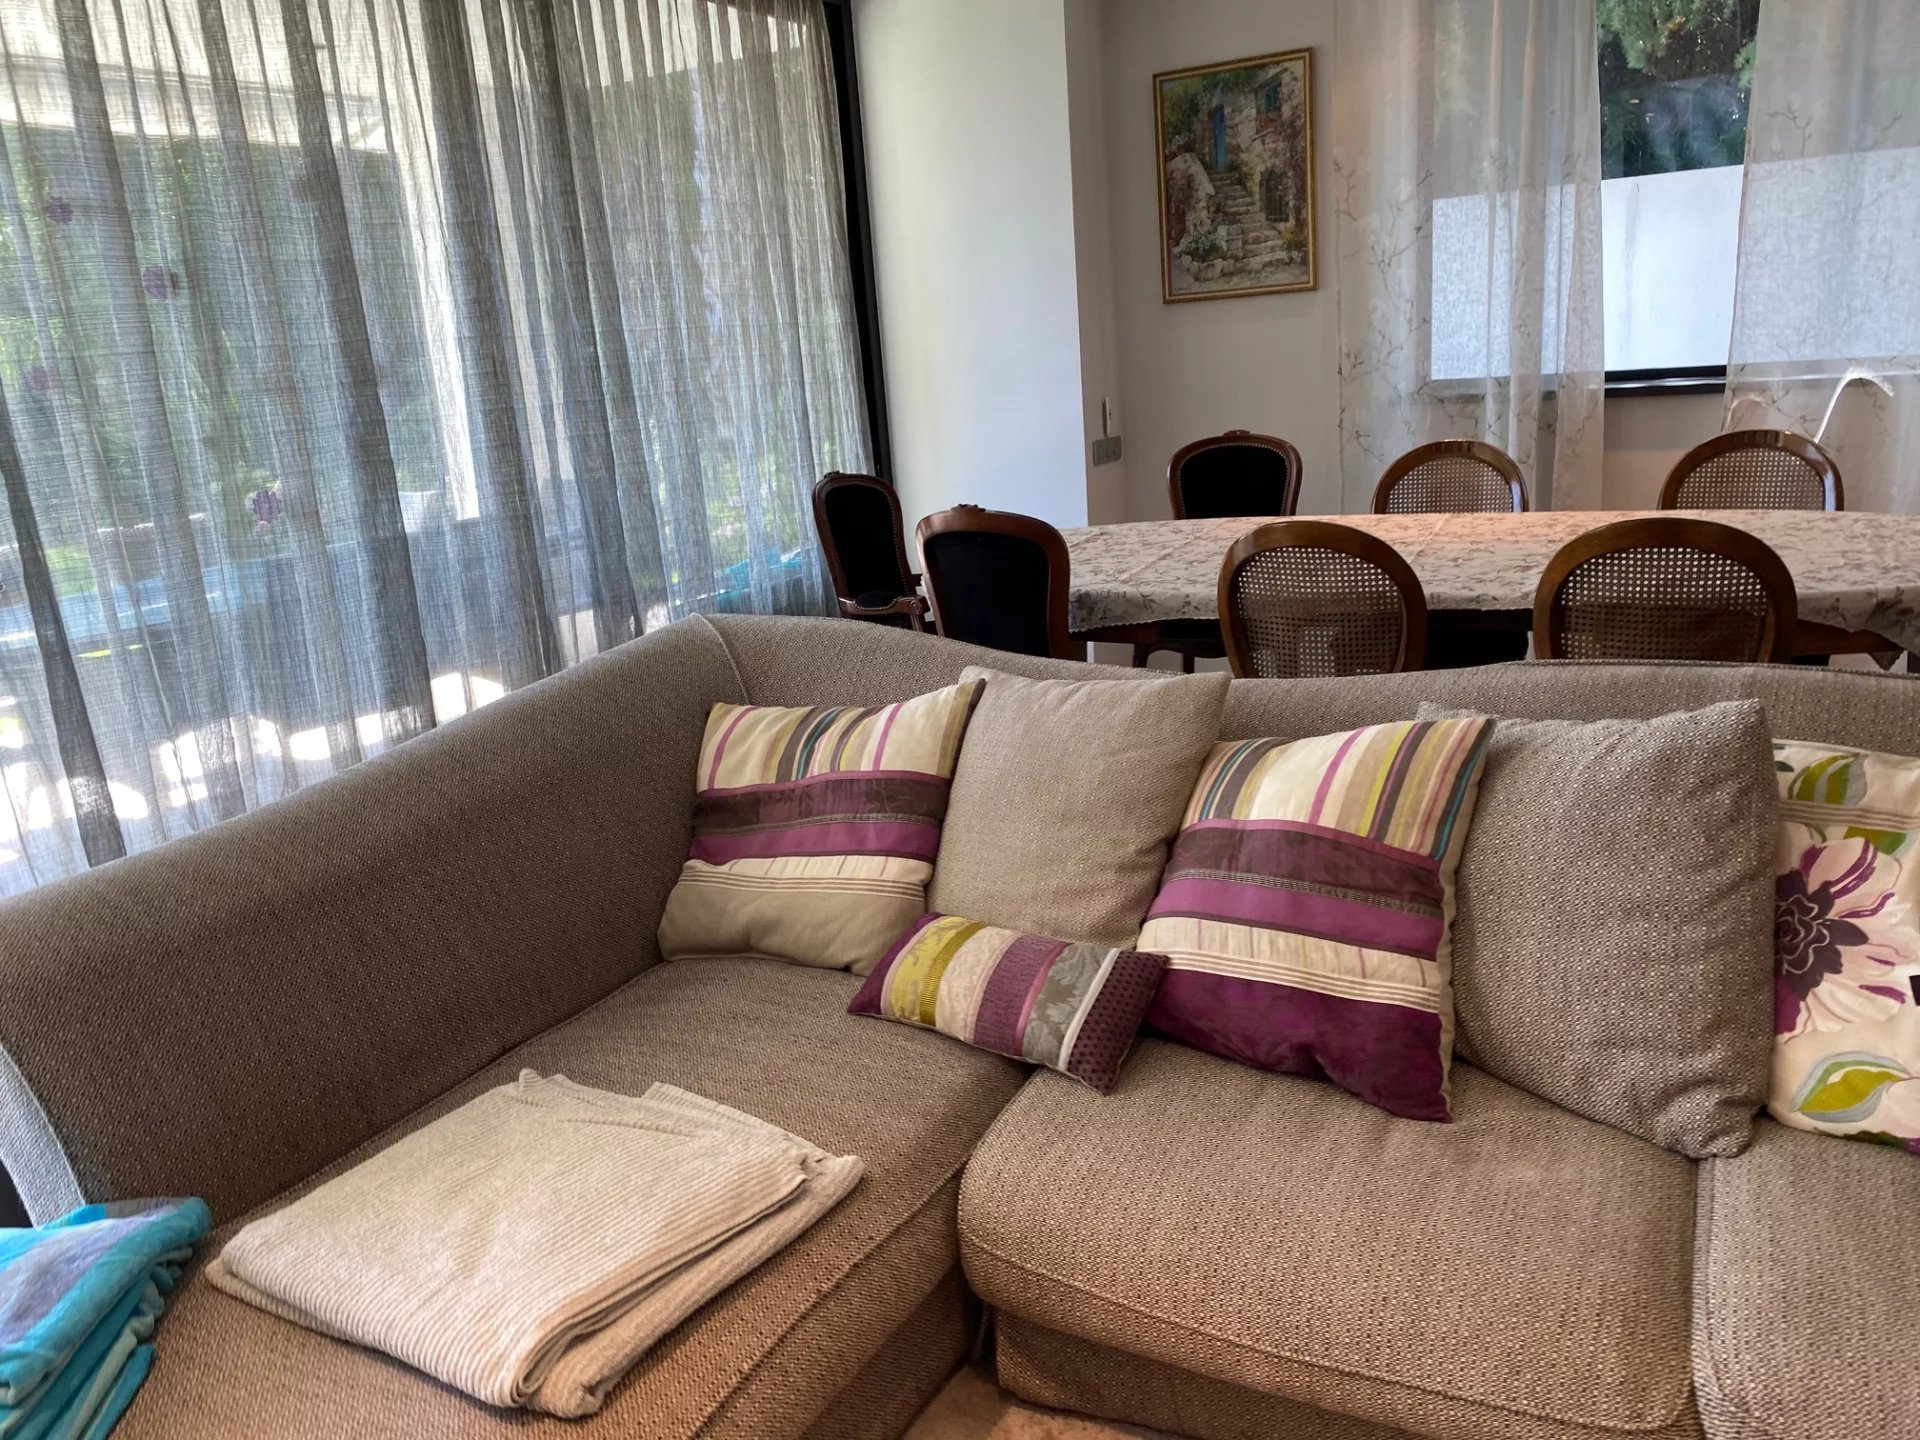 Belle villa climatisée vue mer Cap d'ANTIBES 3 chambres climatisée